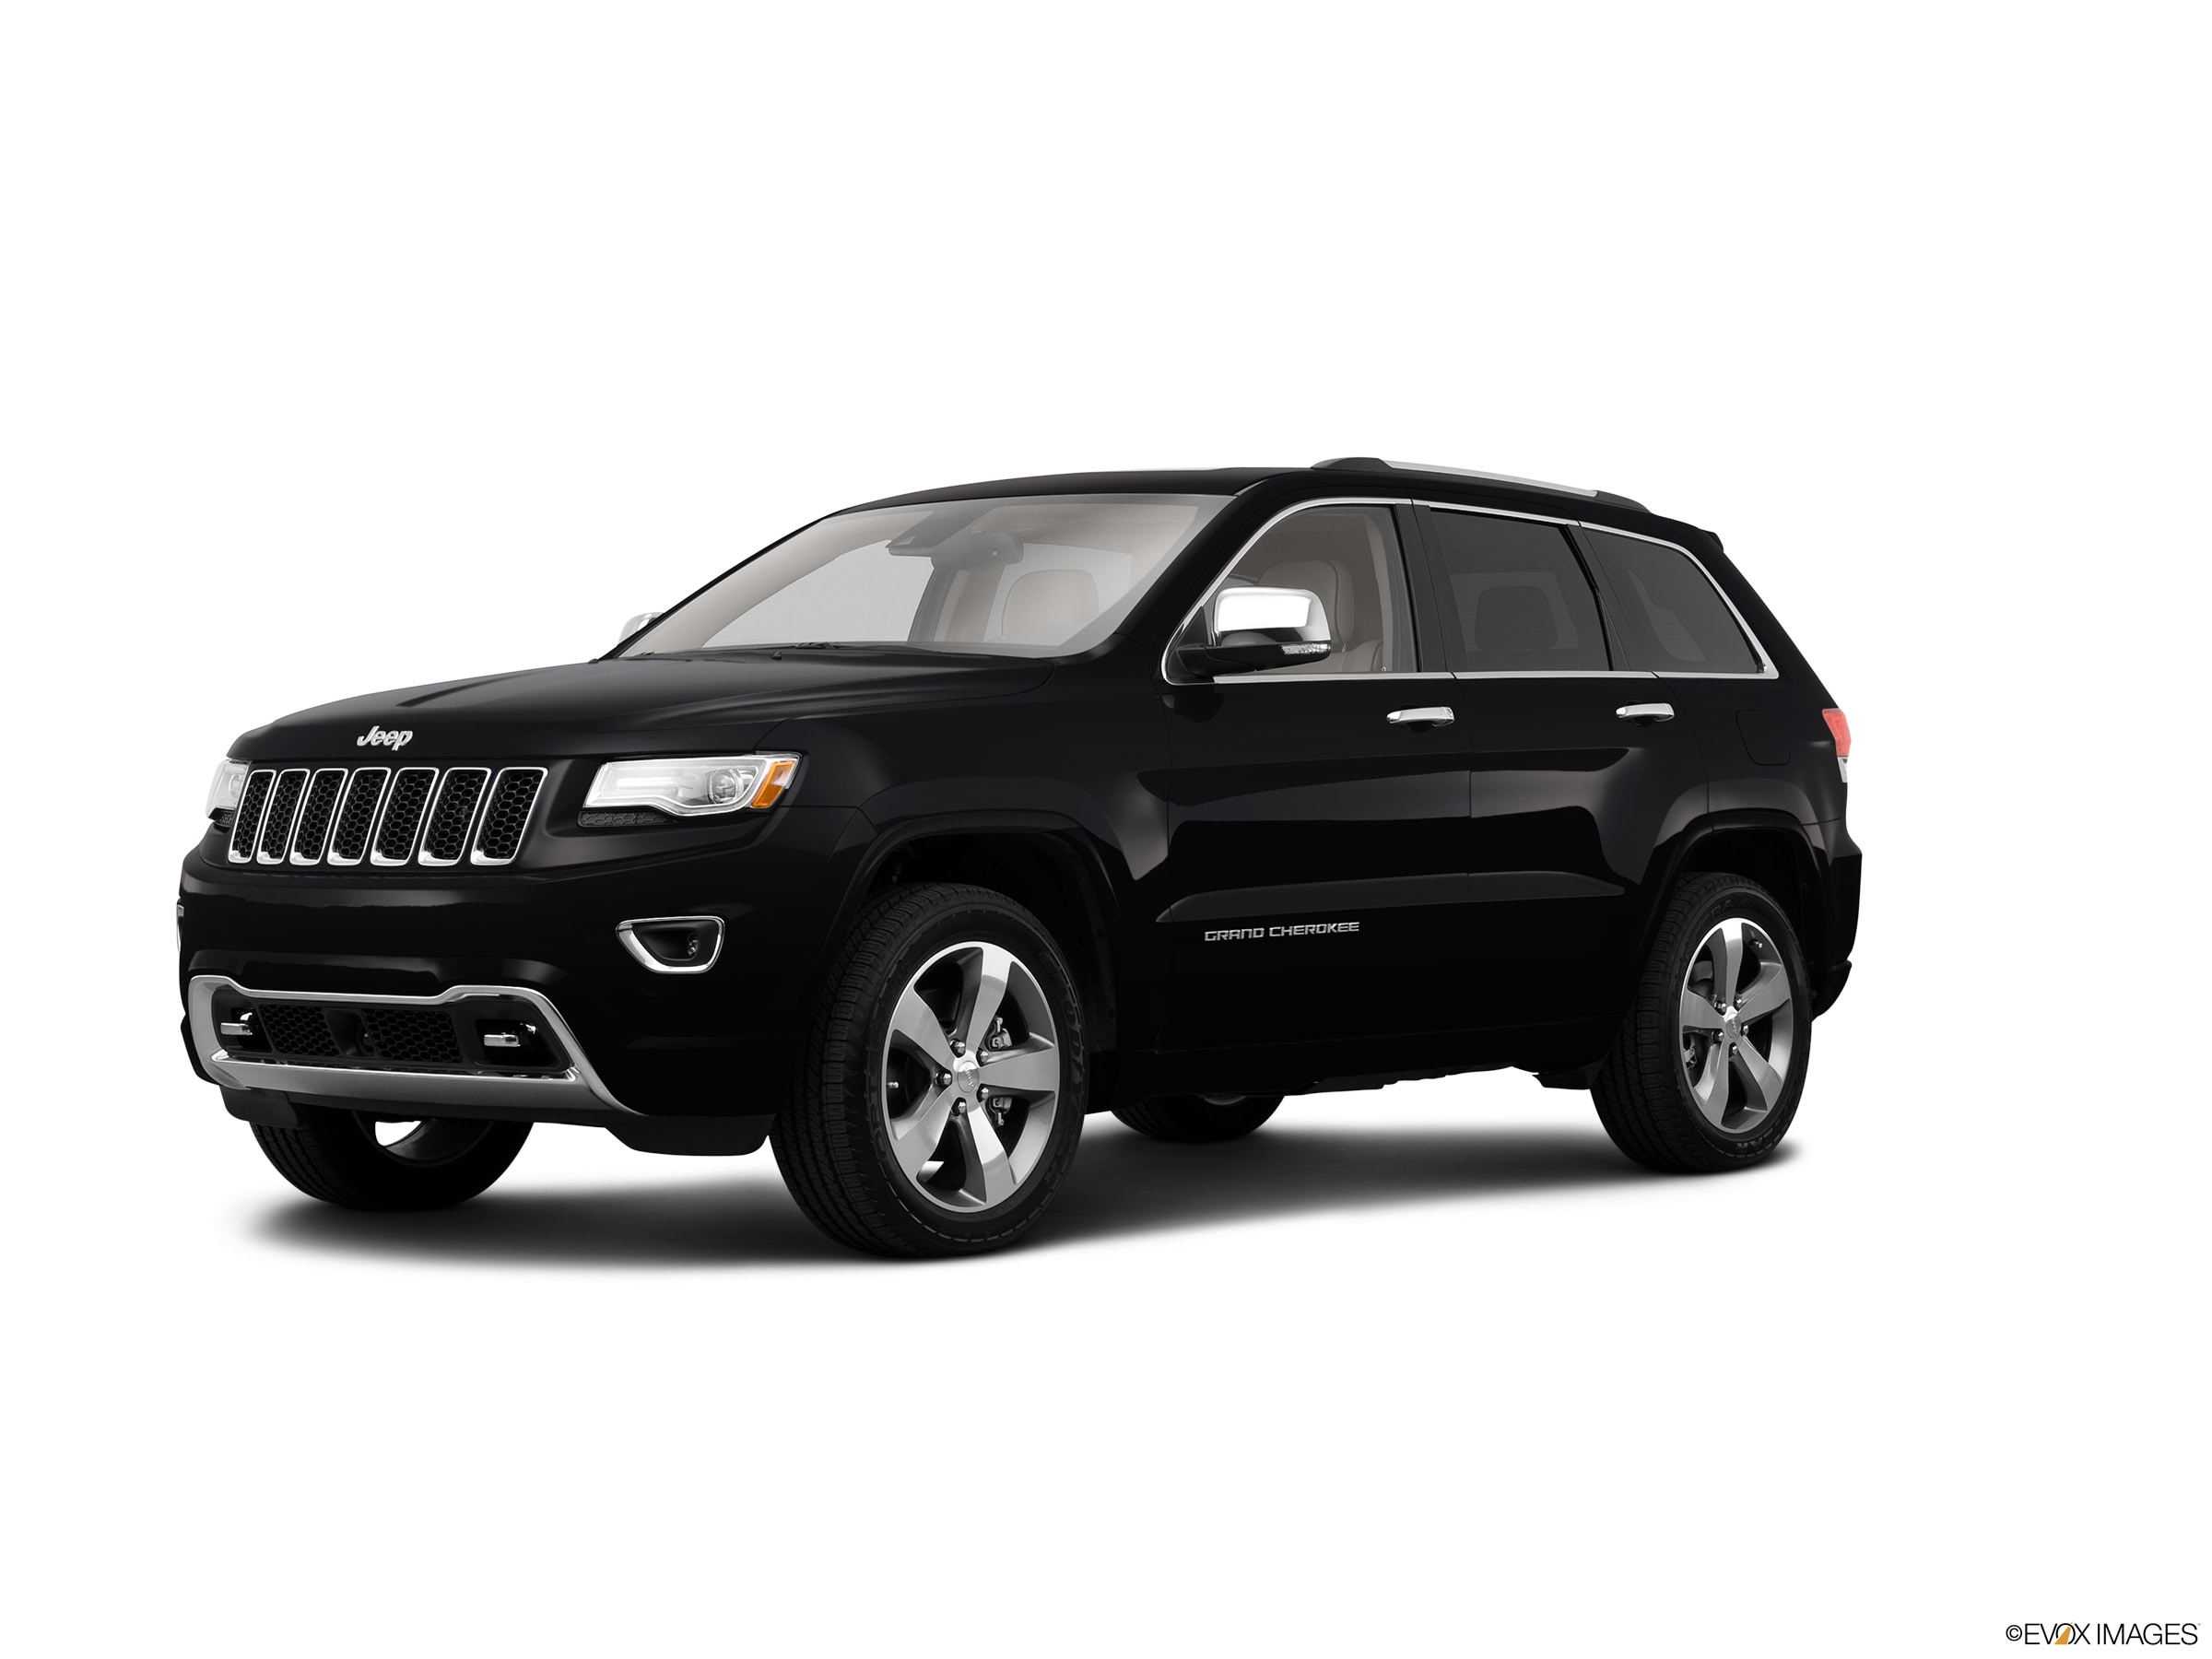 2014 Jeep Grand Cherokee SUV